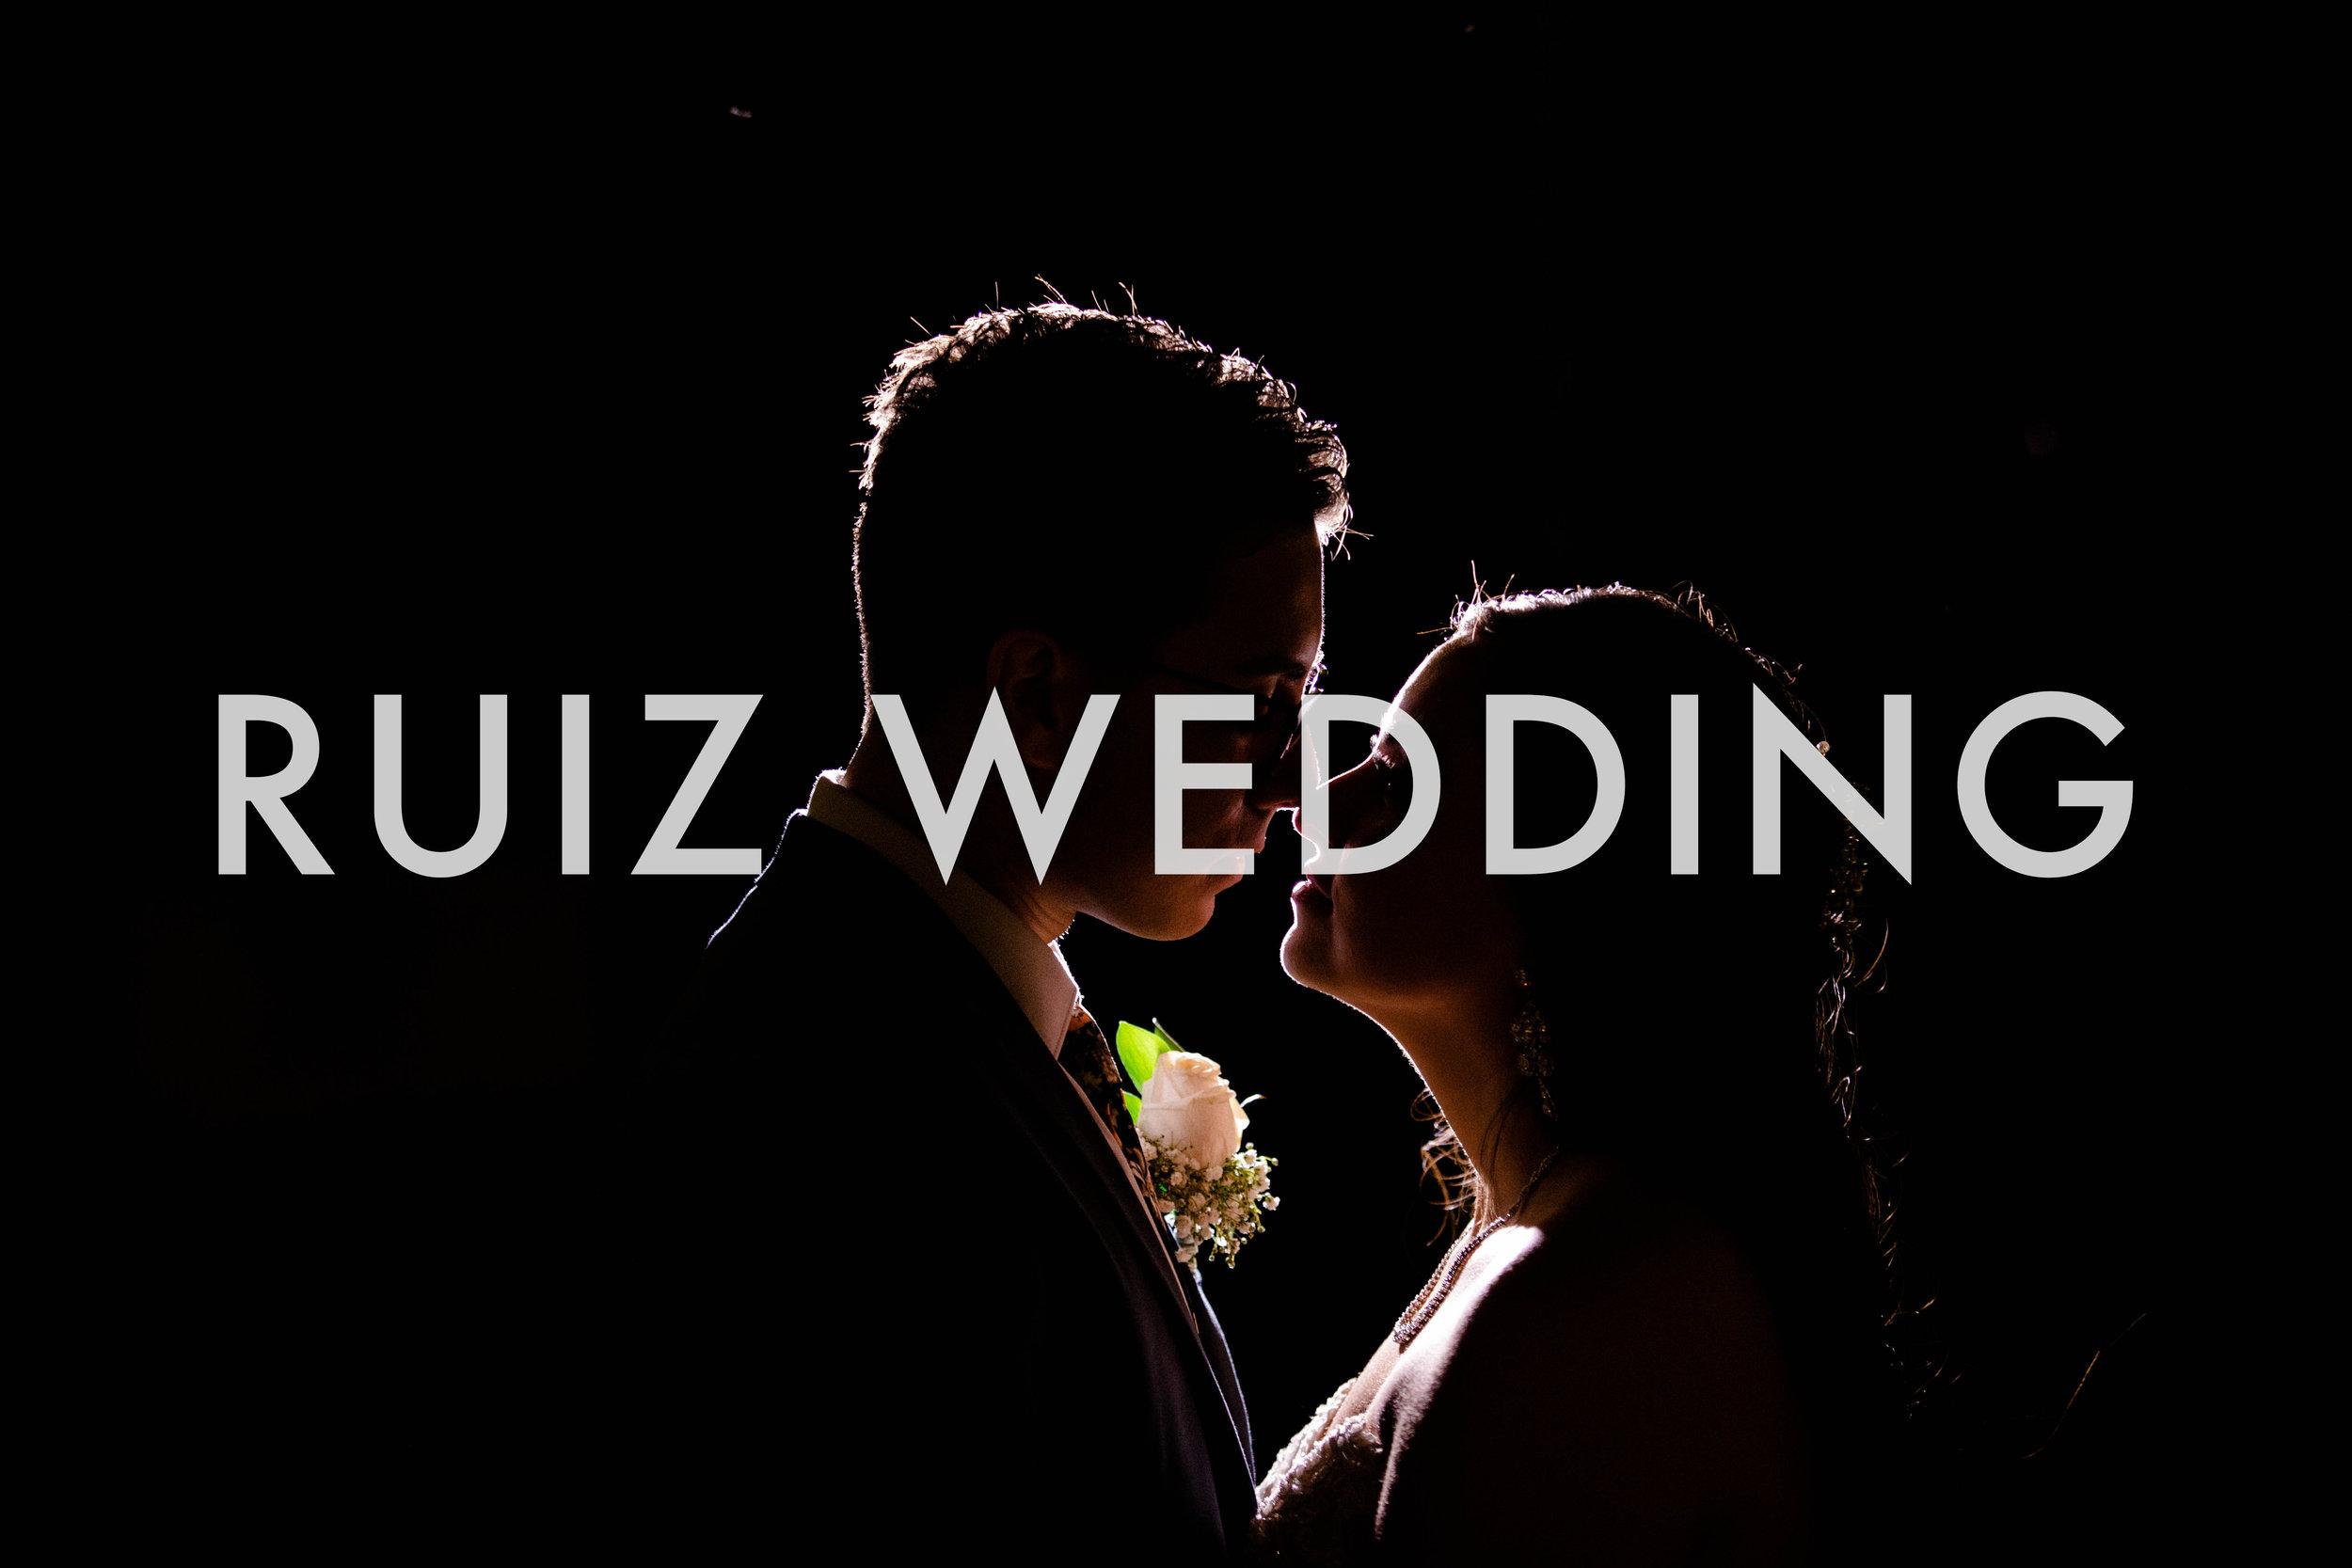 ruiz-wedding-hidden-falls-remis-ridge-stephanie-hanson-photo-new-york-city-wedding-photographer